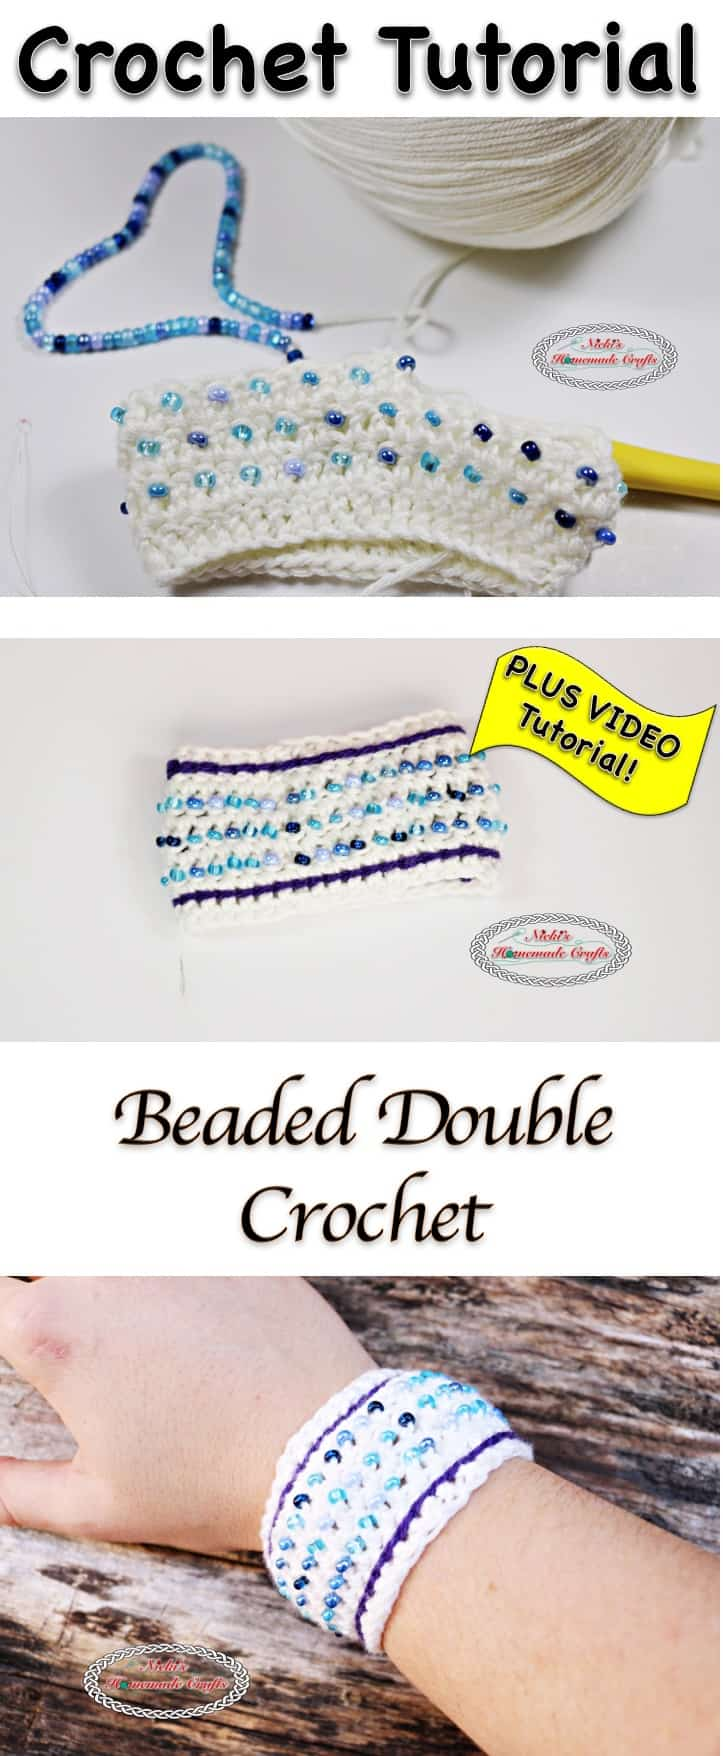 Beaded Double Crochet - Crochet Stitch Tutorial